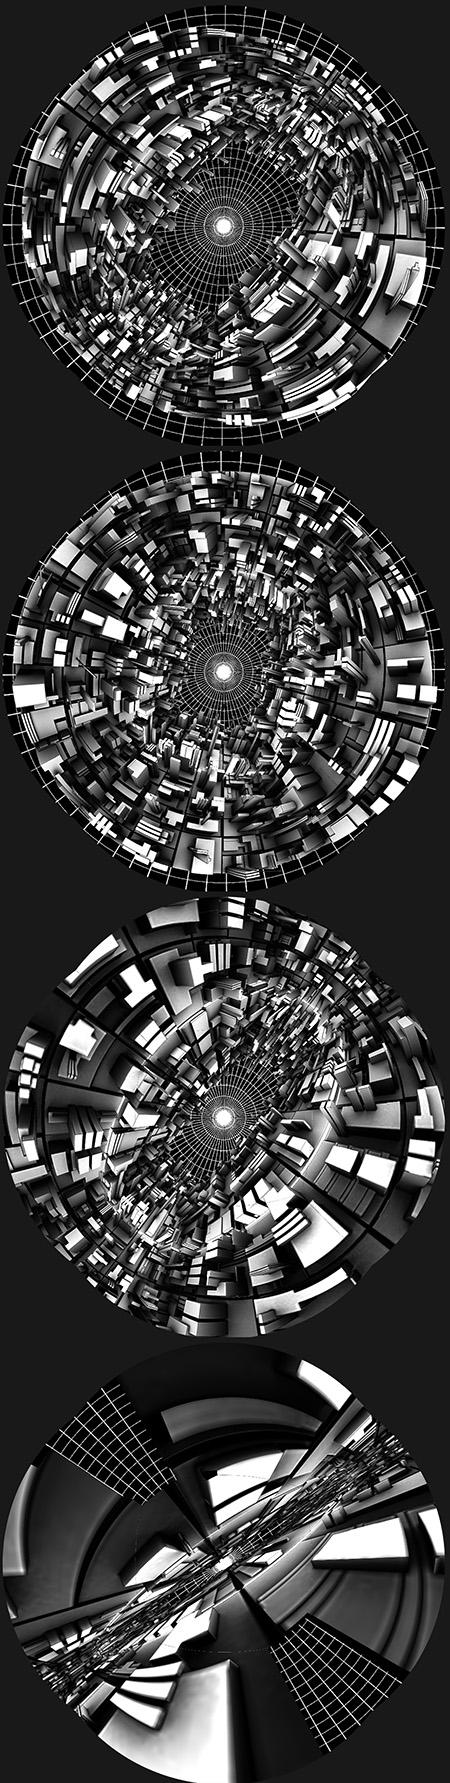 QUANTUM: Spherical Mapping